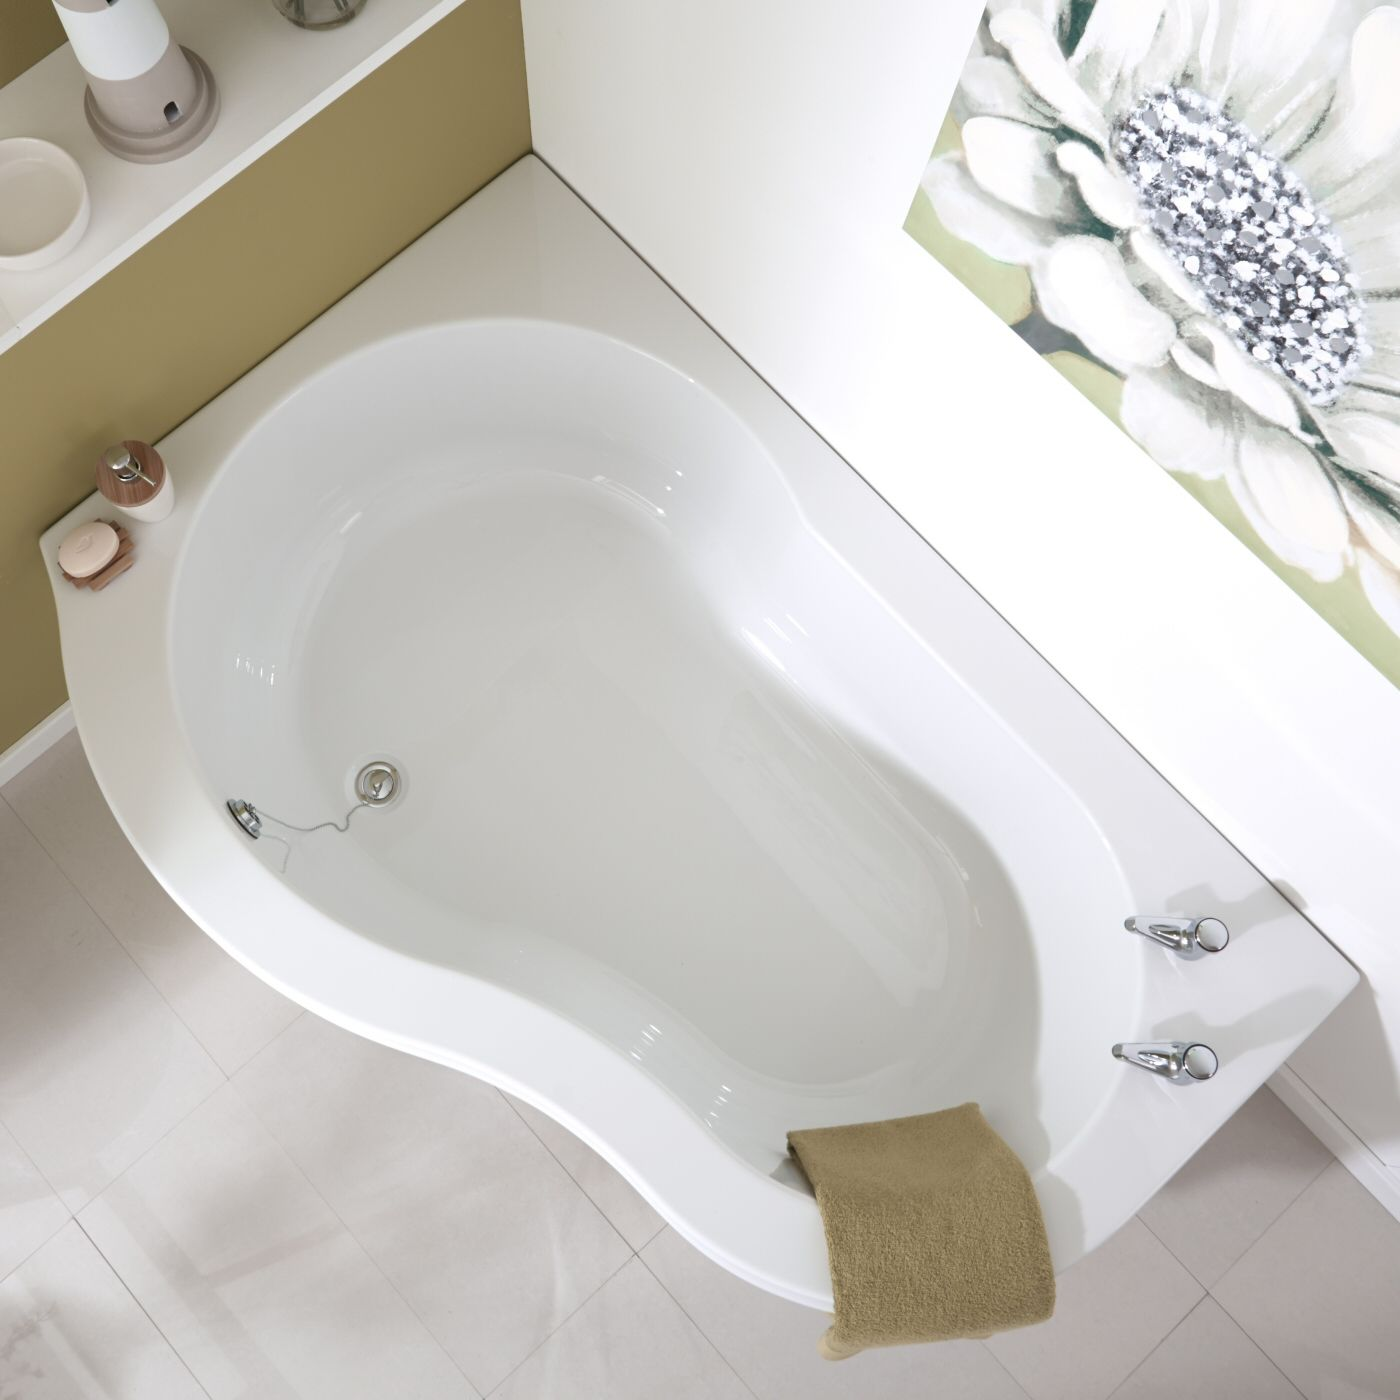 Bathroom furniture brisbane   bathroom design 2017-2018   Pinterest ...